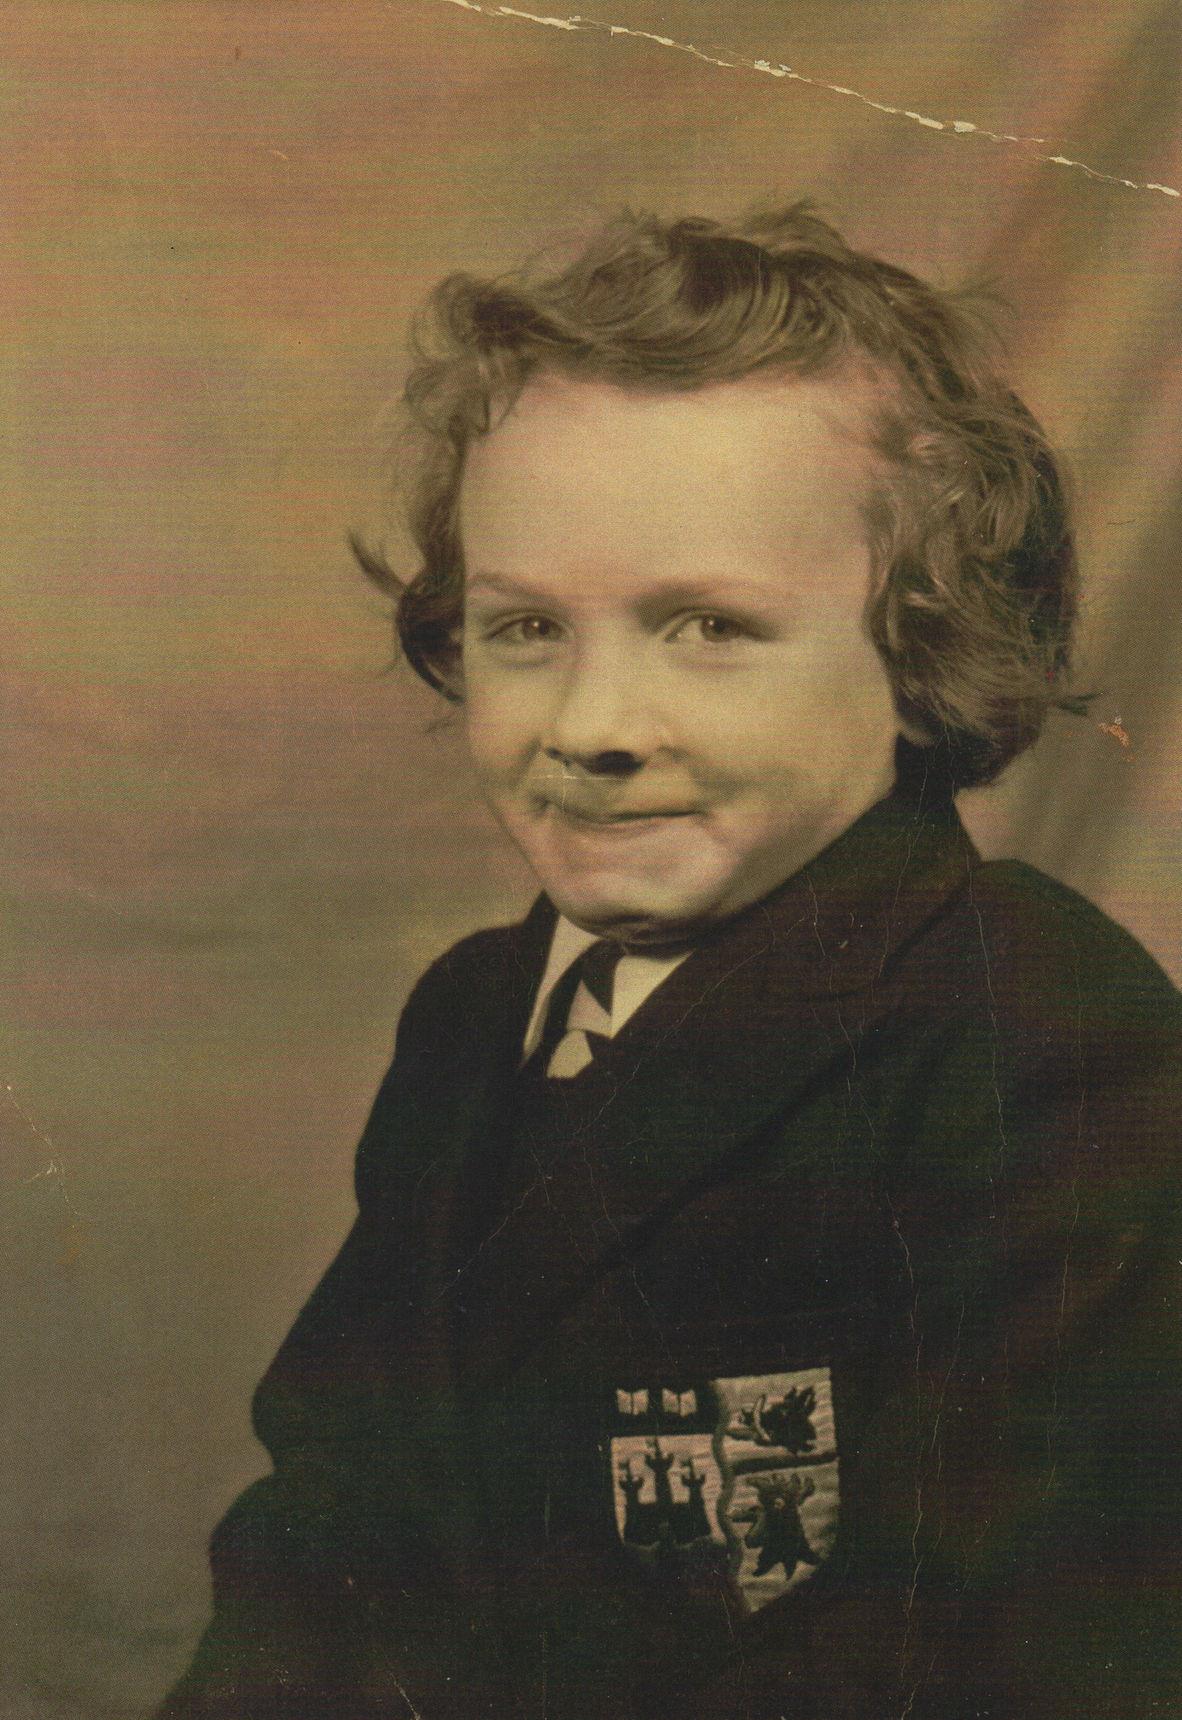 Margaret Lee - Starting Dean Primary School aged 5.